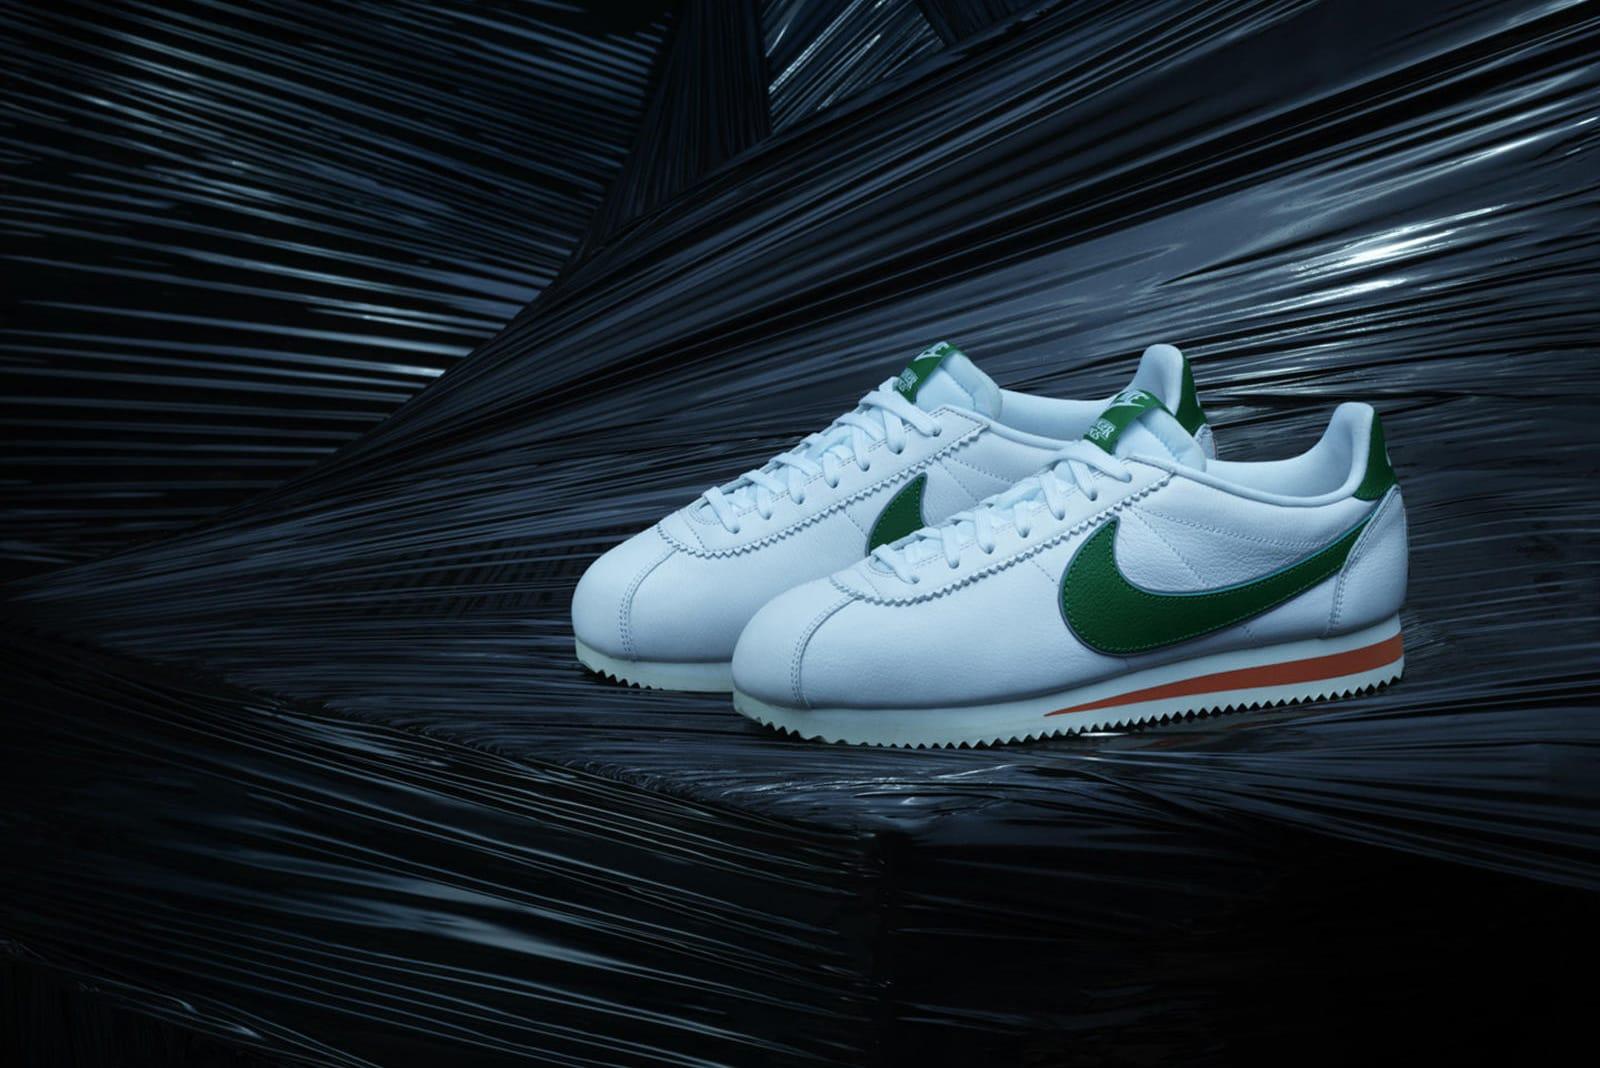 Nike x Stranger Things Capsule